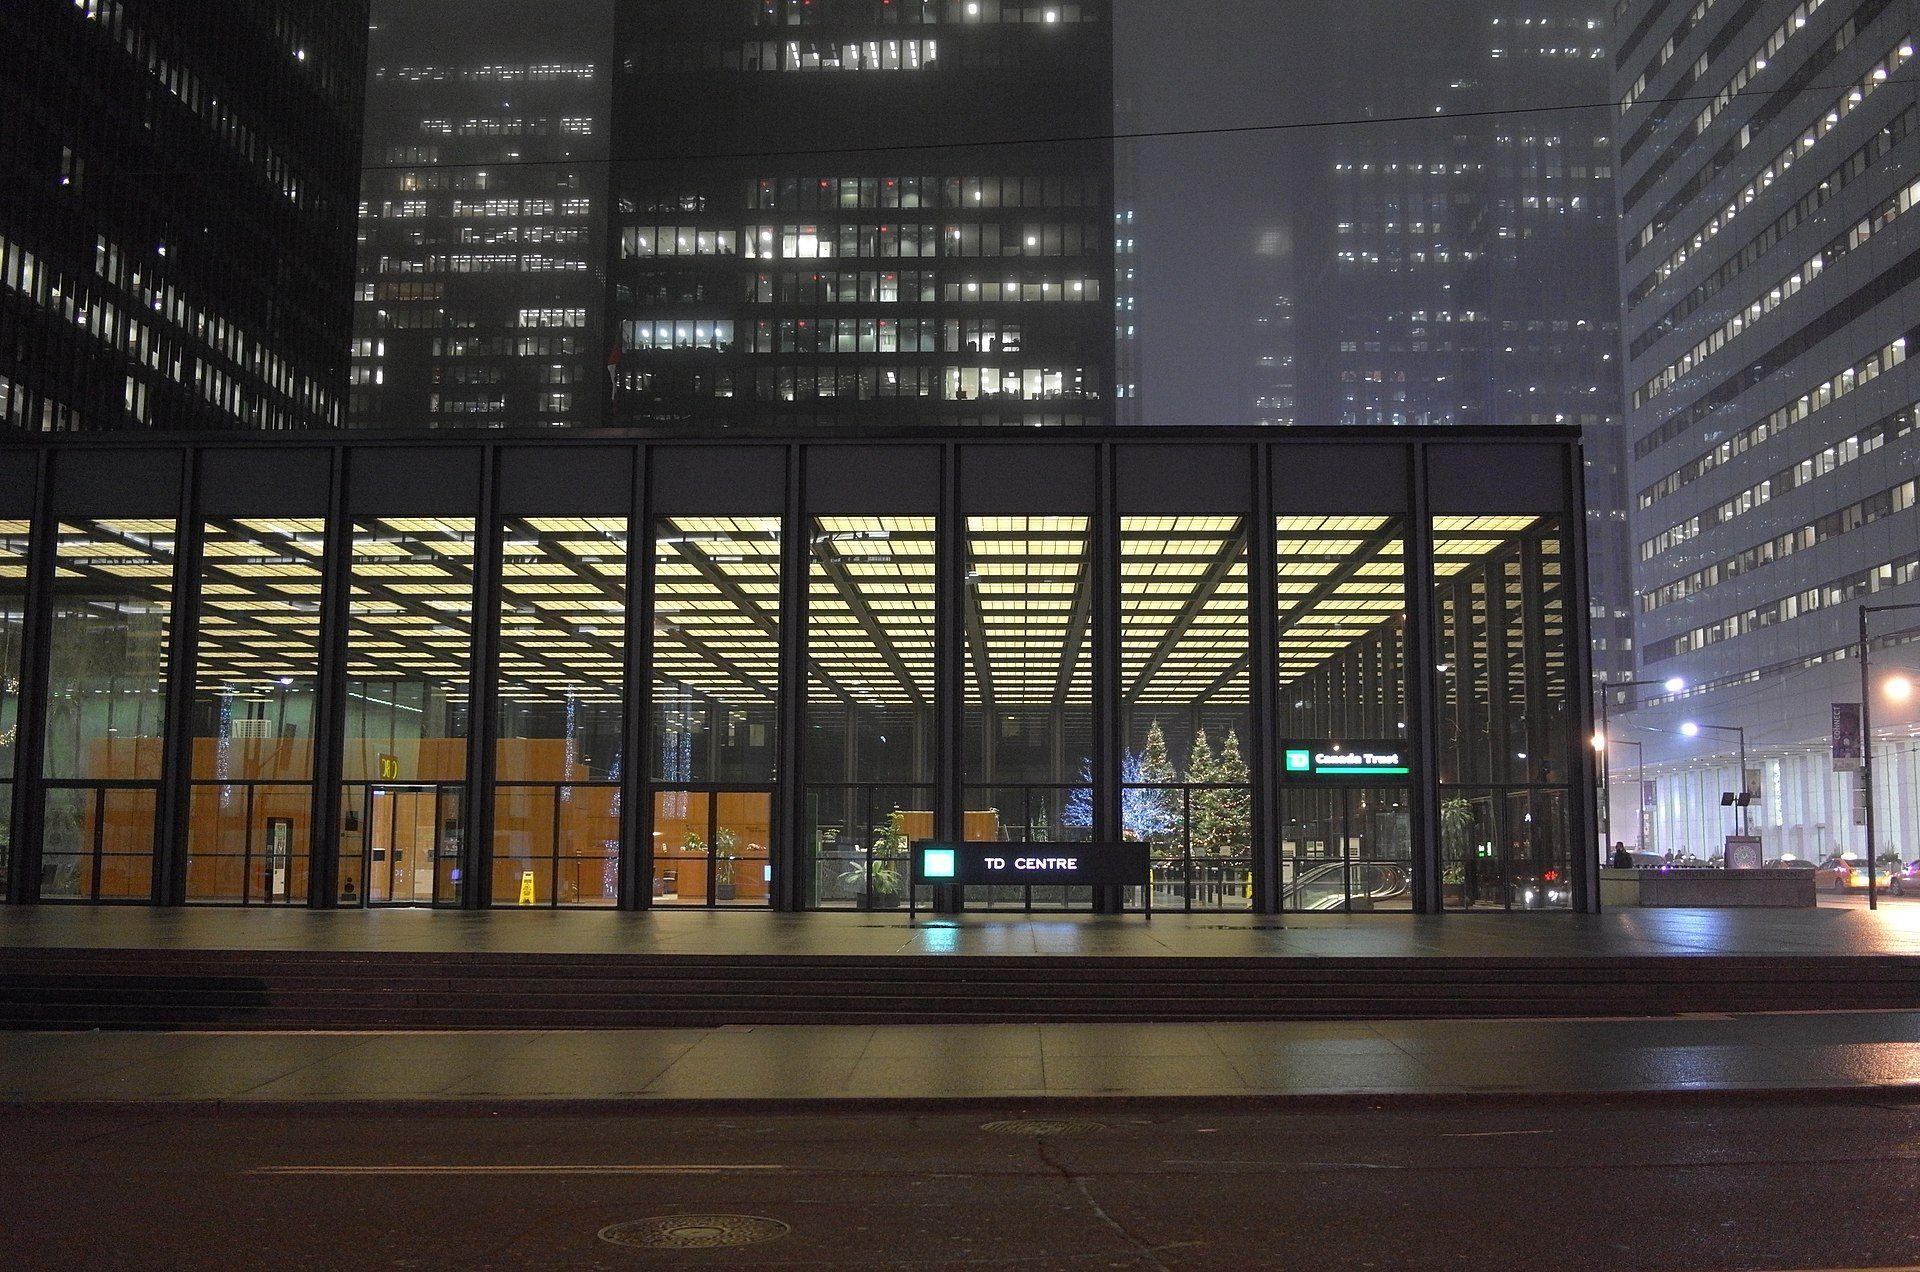 TD Centre banking pavillion 15464613453 - Toronto-Dominion